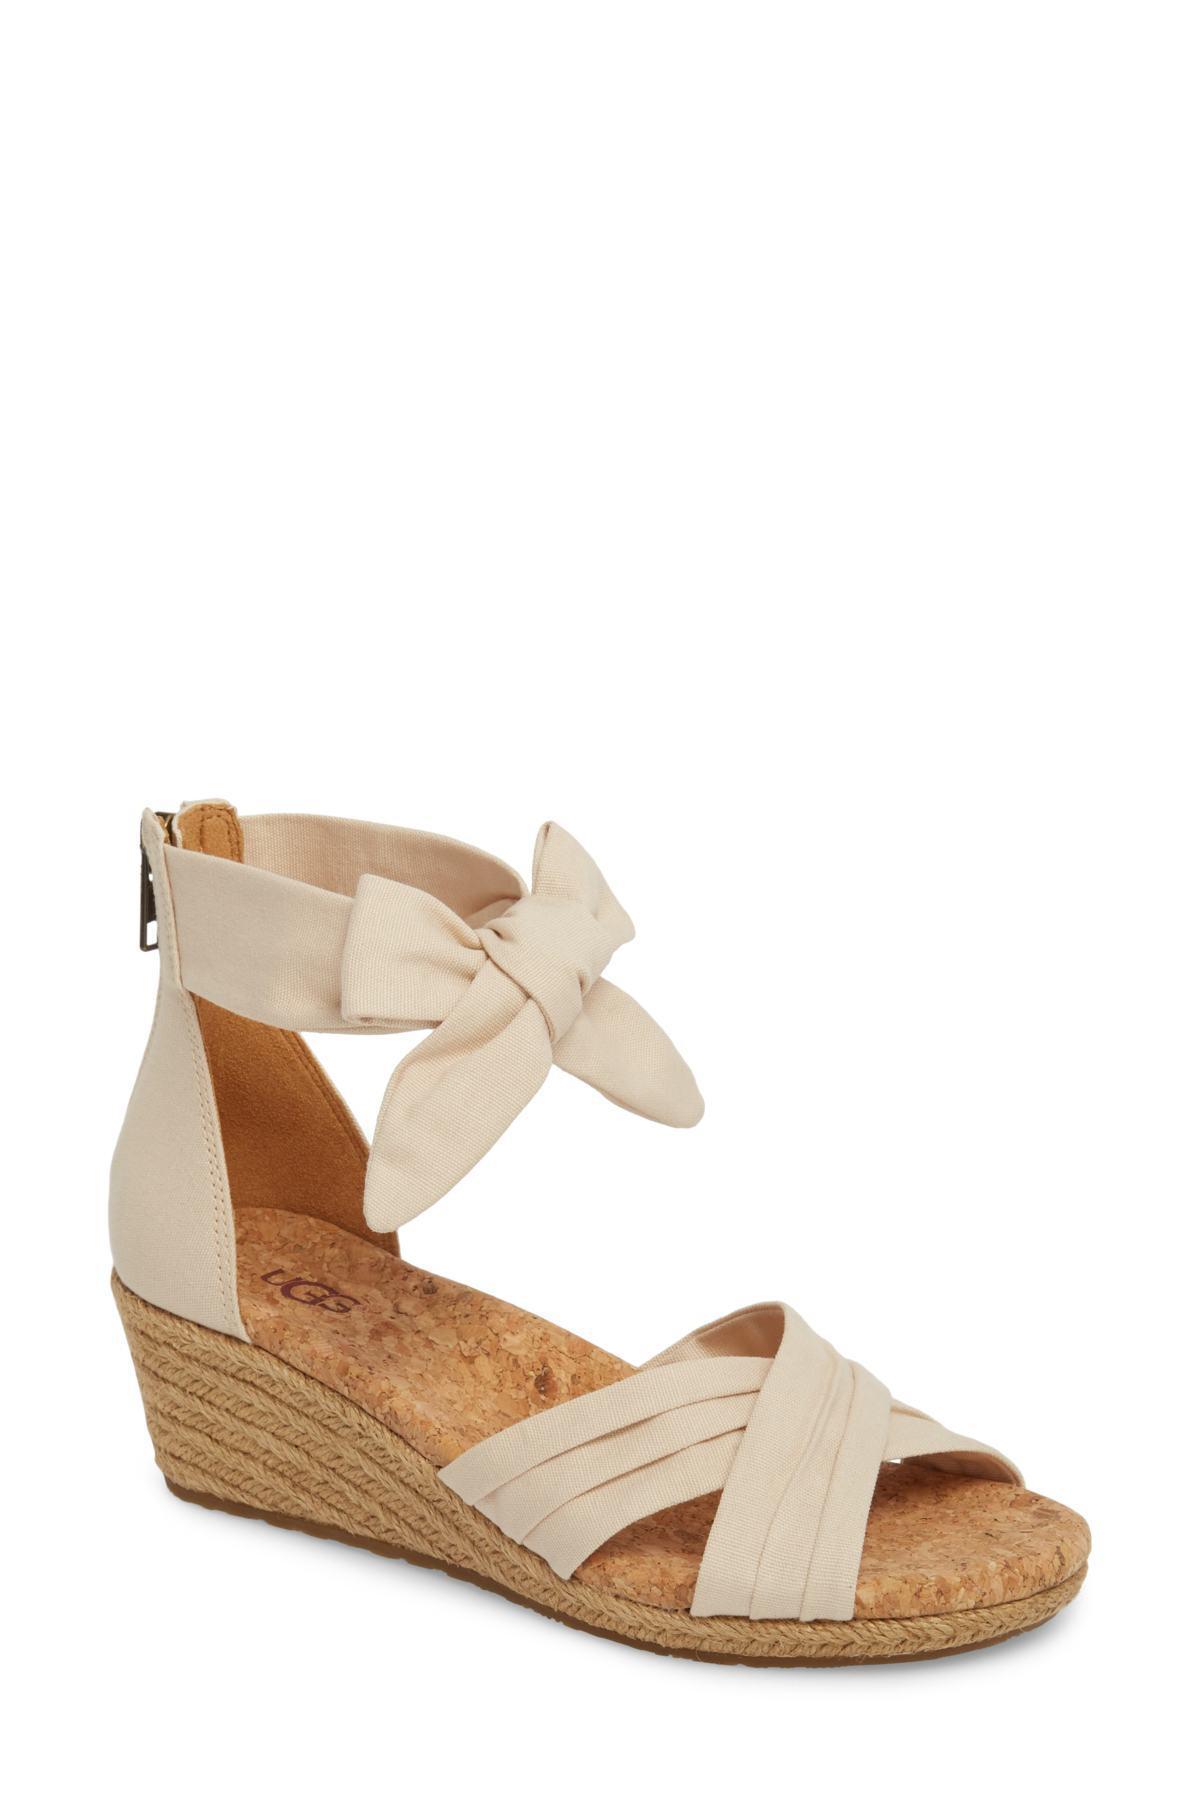 e707f998a1b Lyst - Ugg (r) Traci Espadrille Wedge Sandal (women)